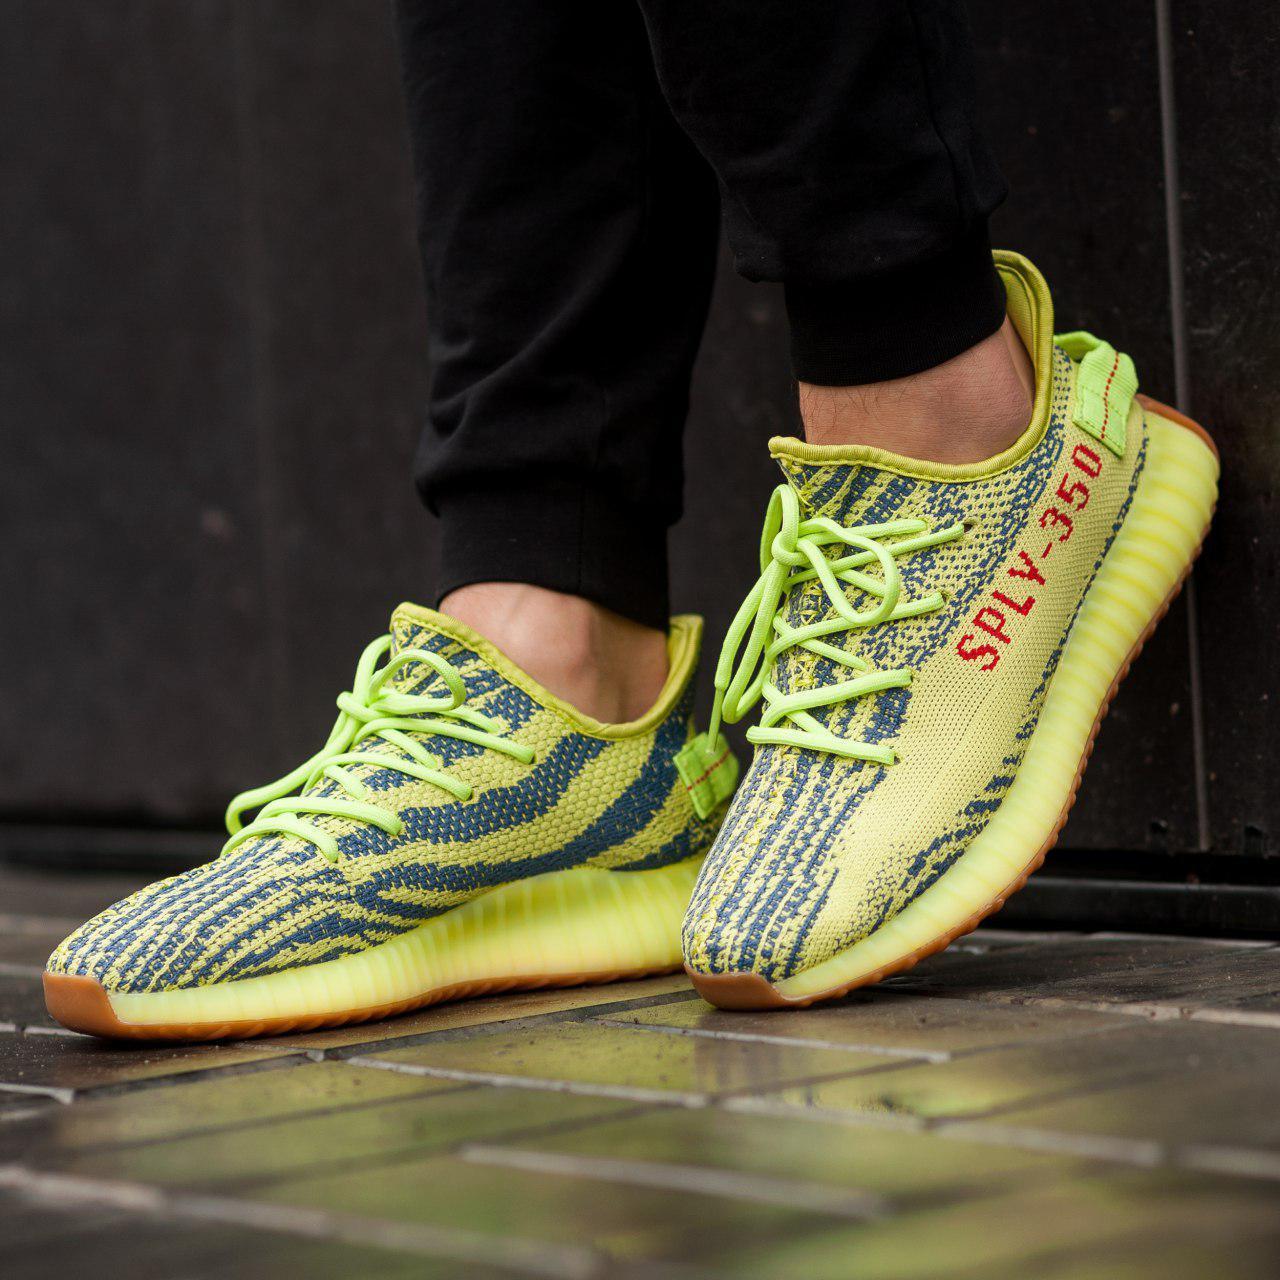 Мужские кроссовки Adidas Yeezy Boost 350 Yellow (Реплика ААА+)